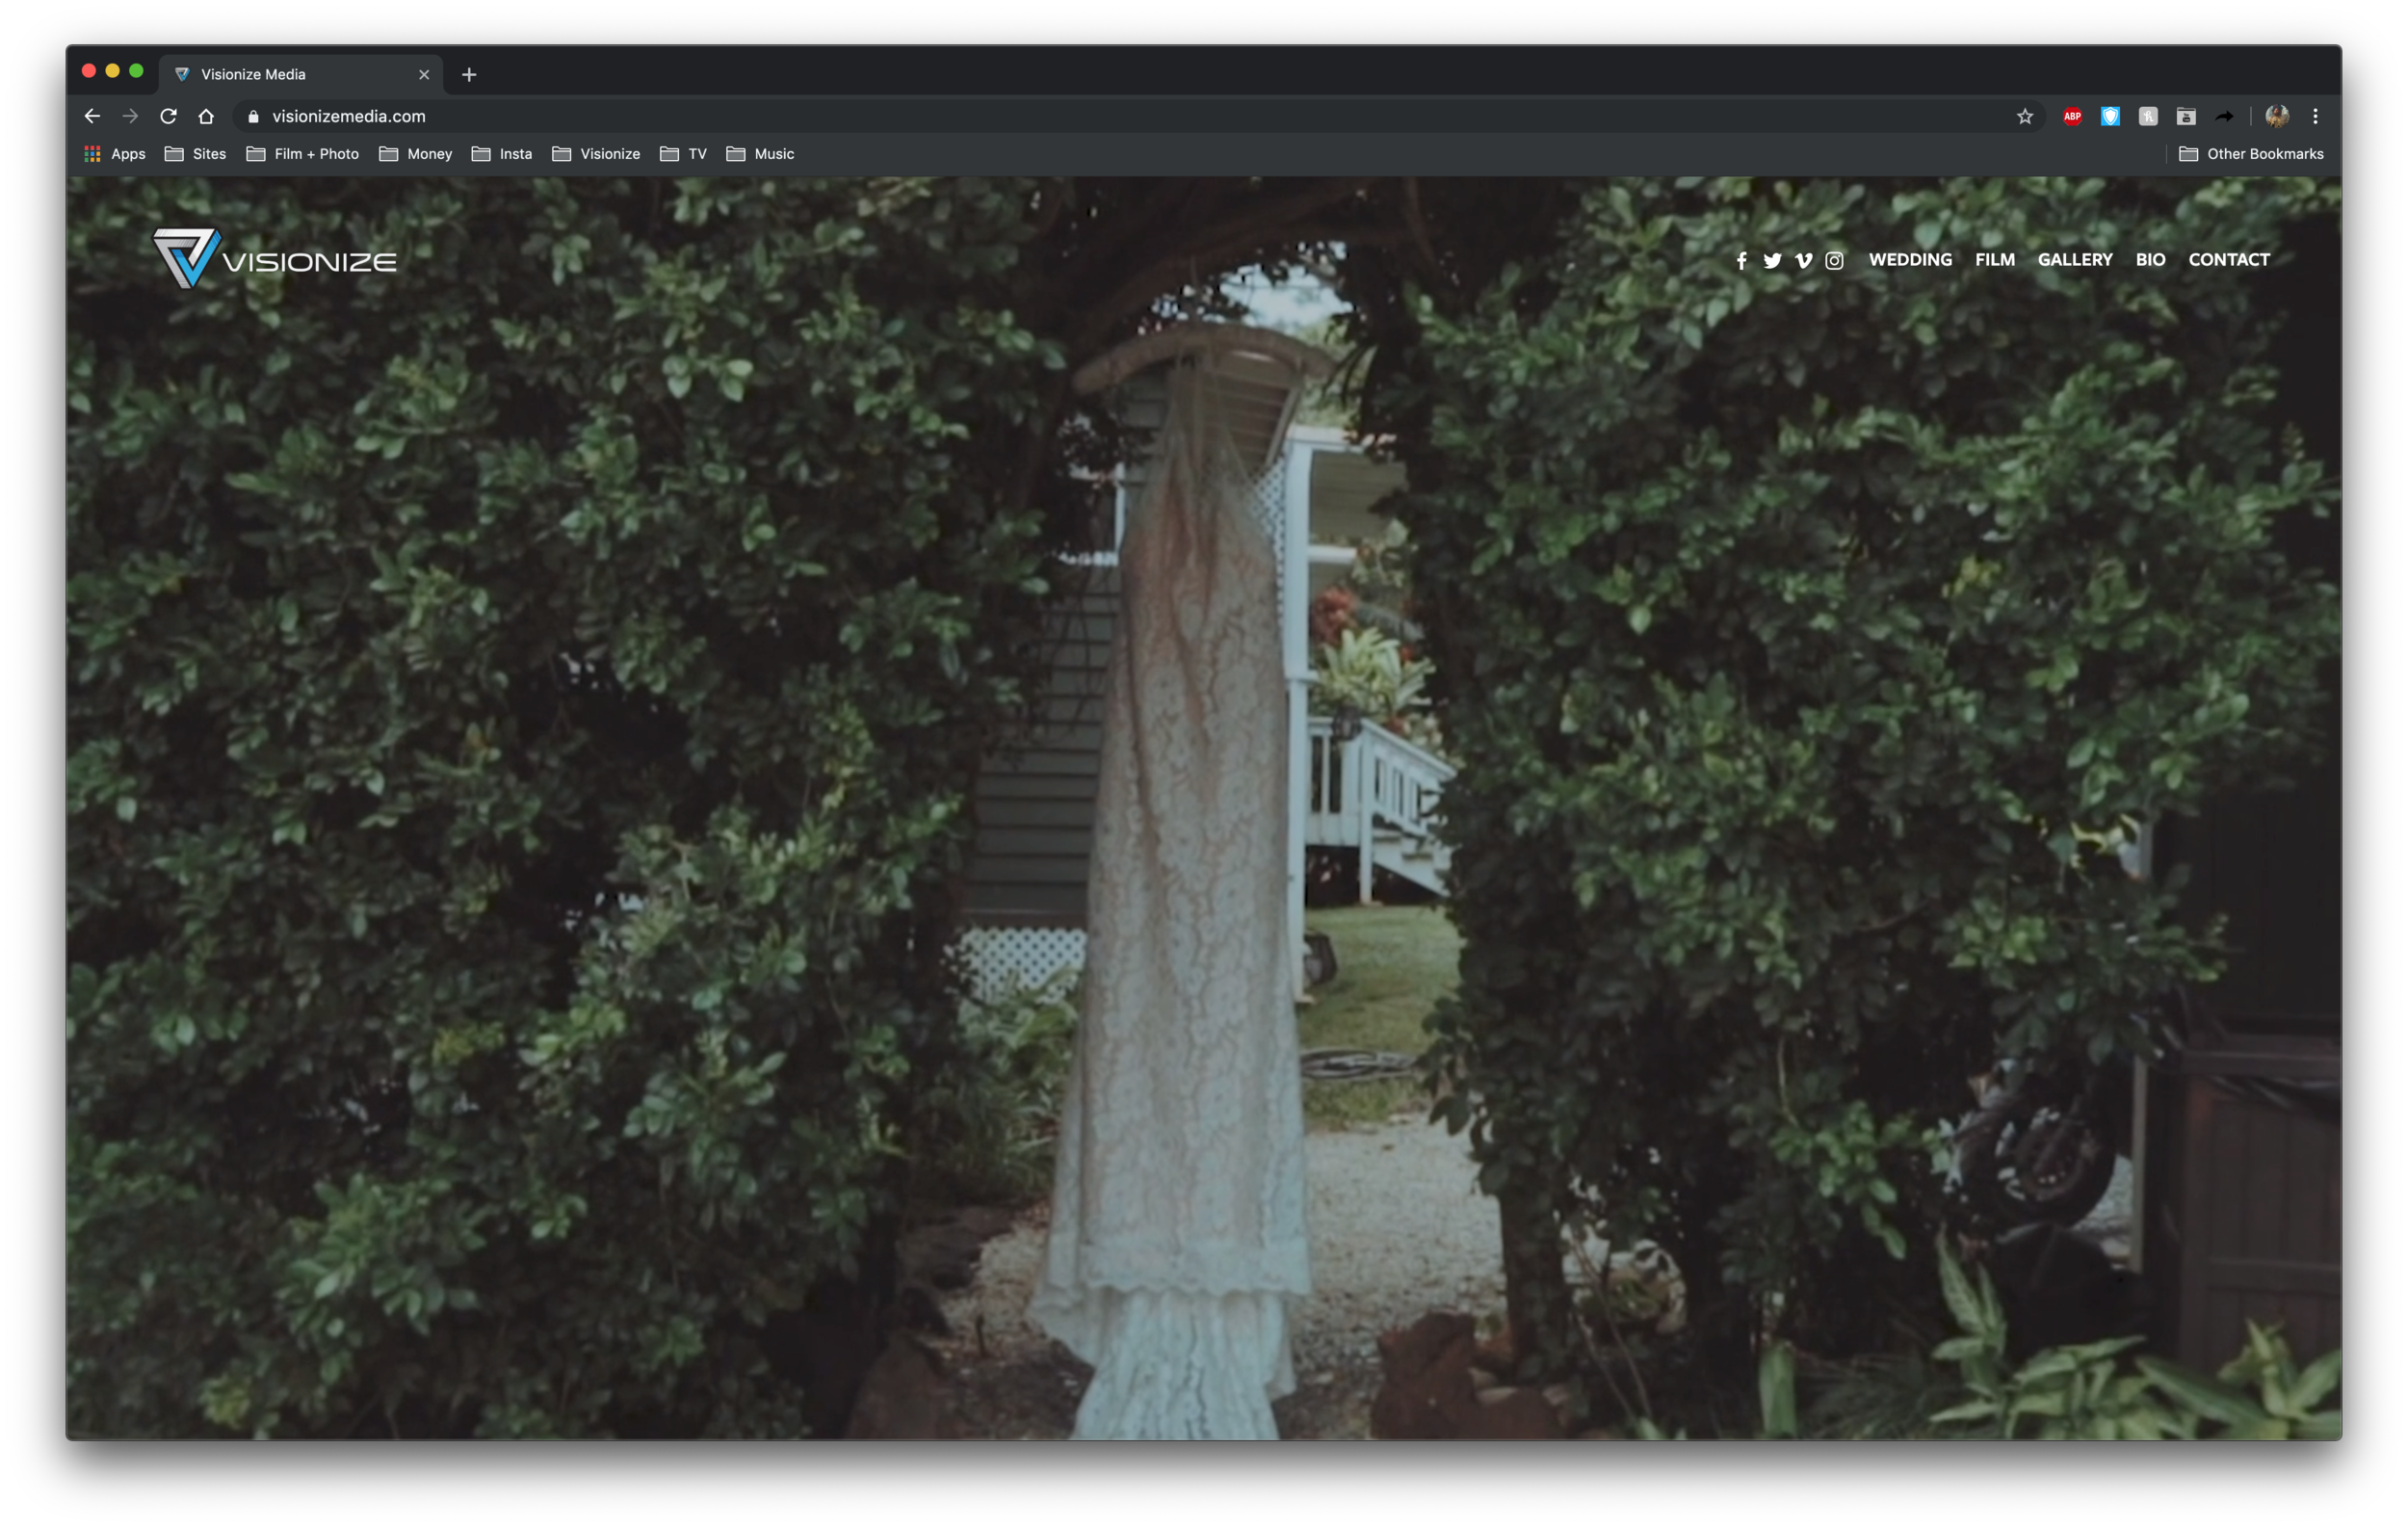 Screenshot 2019-09-23 14.21.36.png